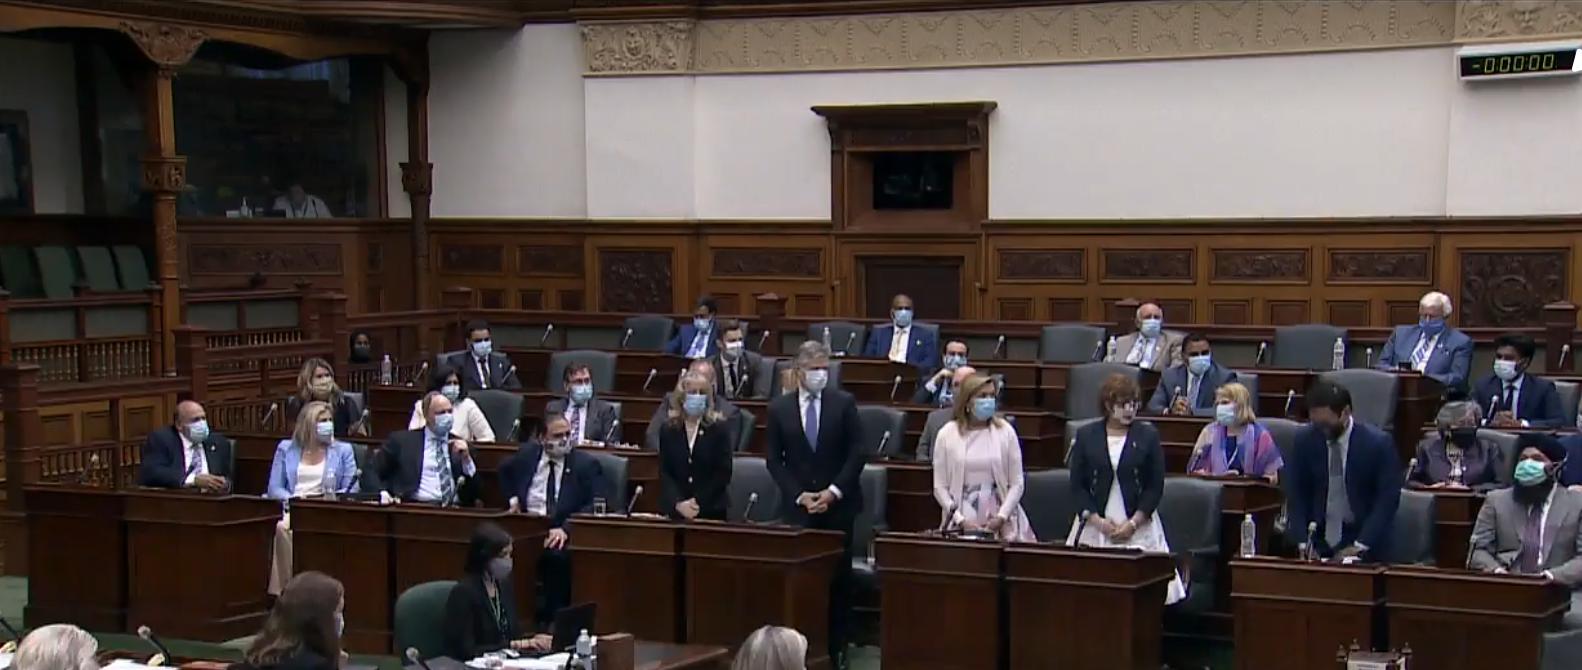 Ontario pushing through changes to tenancy law as crisis looms